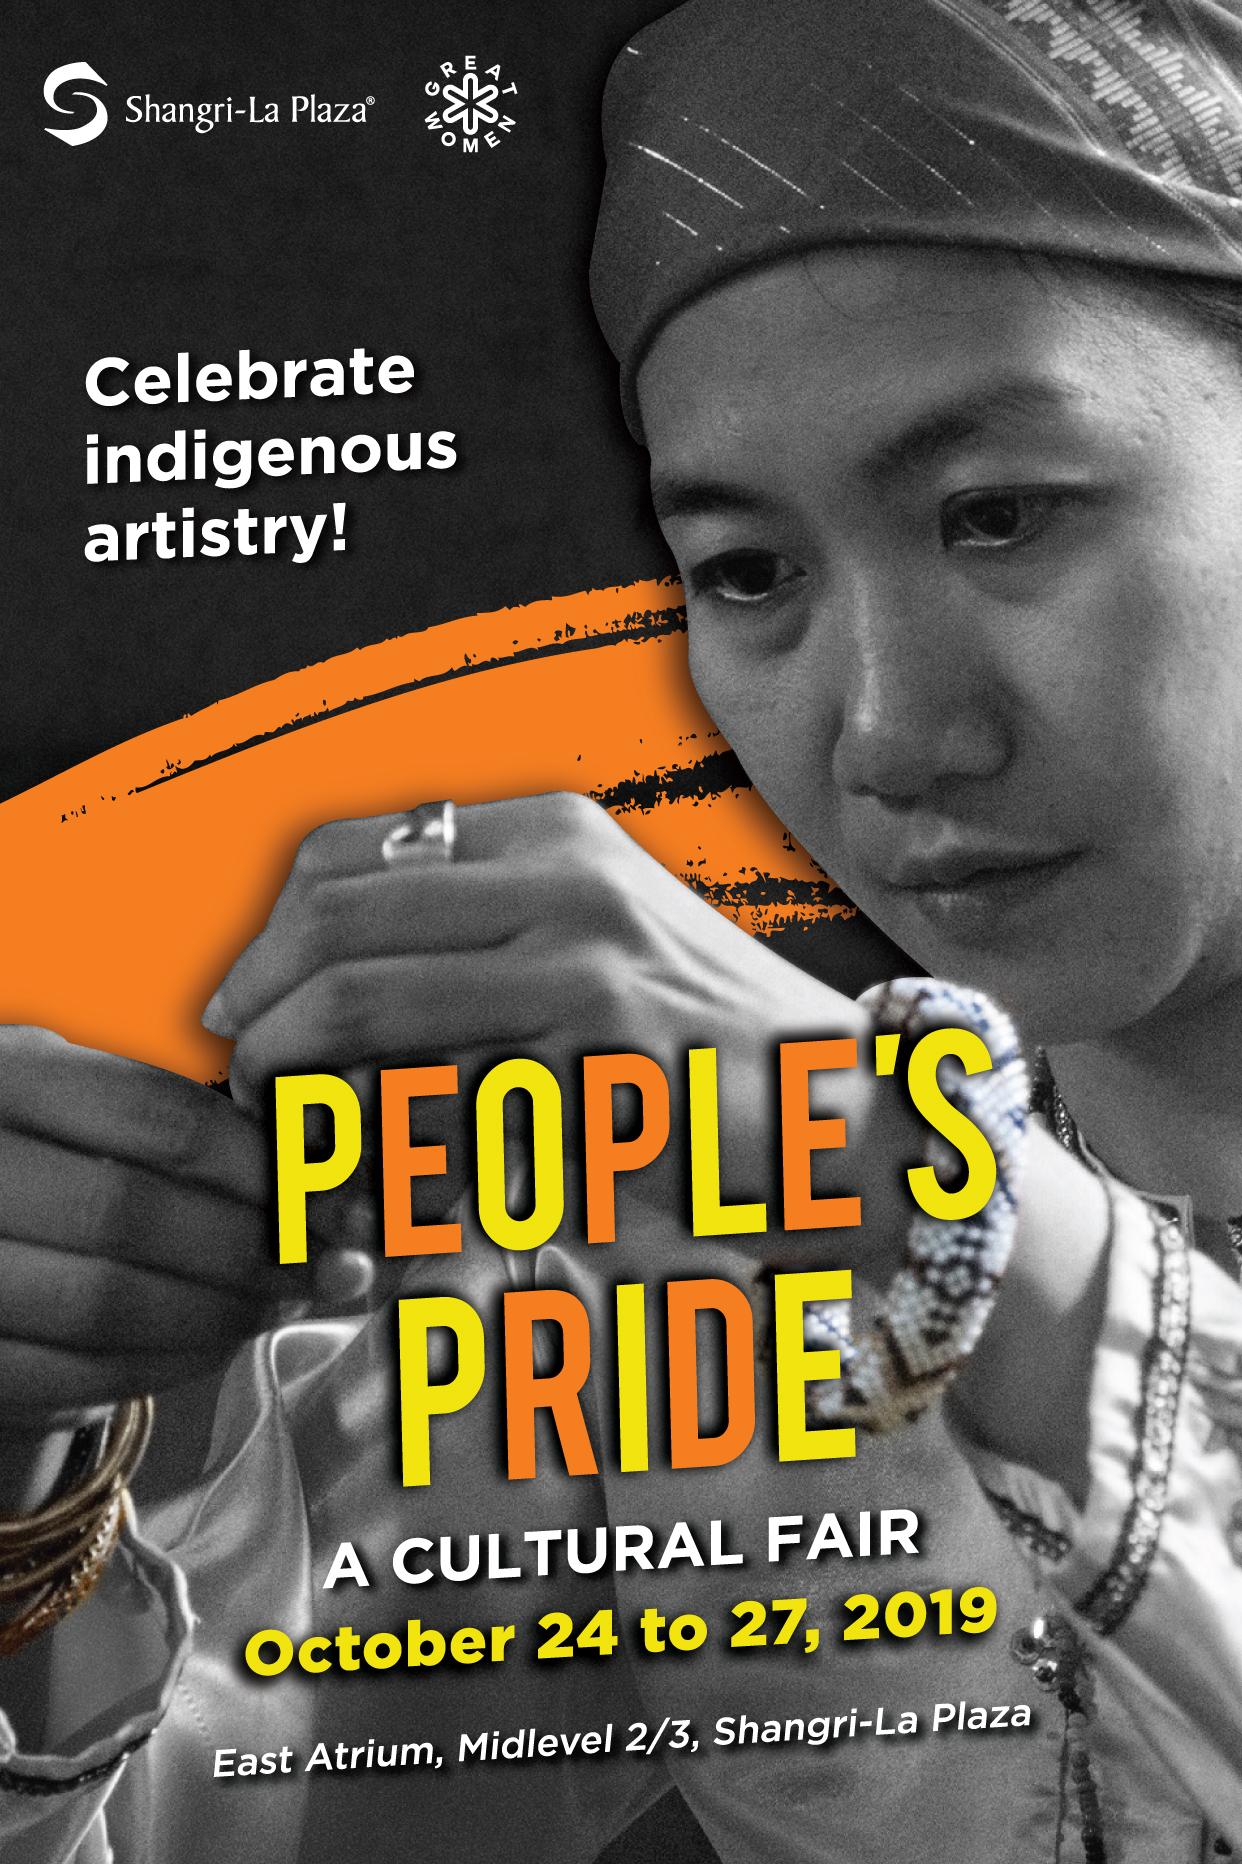 People's Pride Cultural Fair Poster